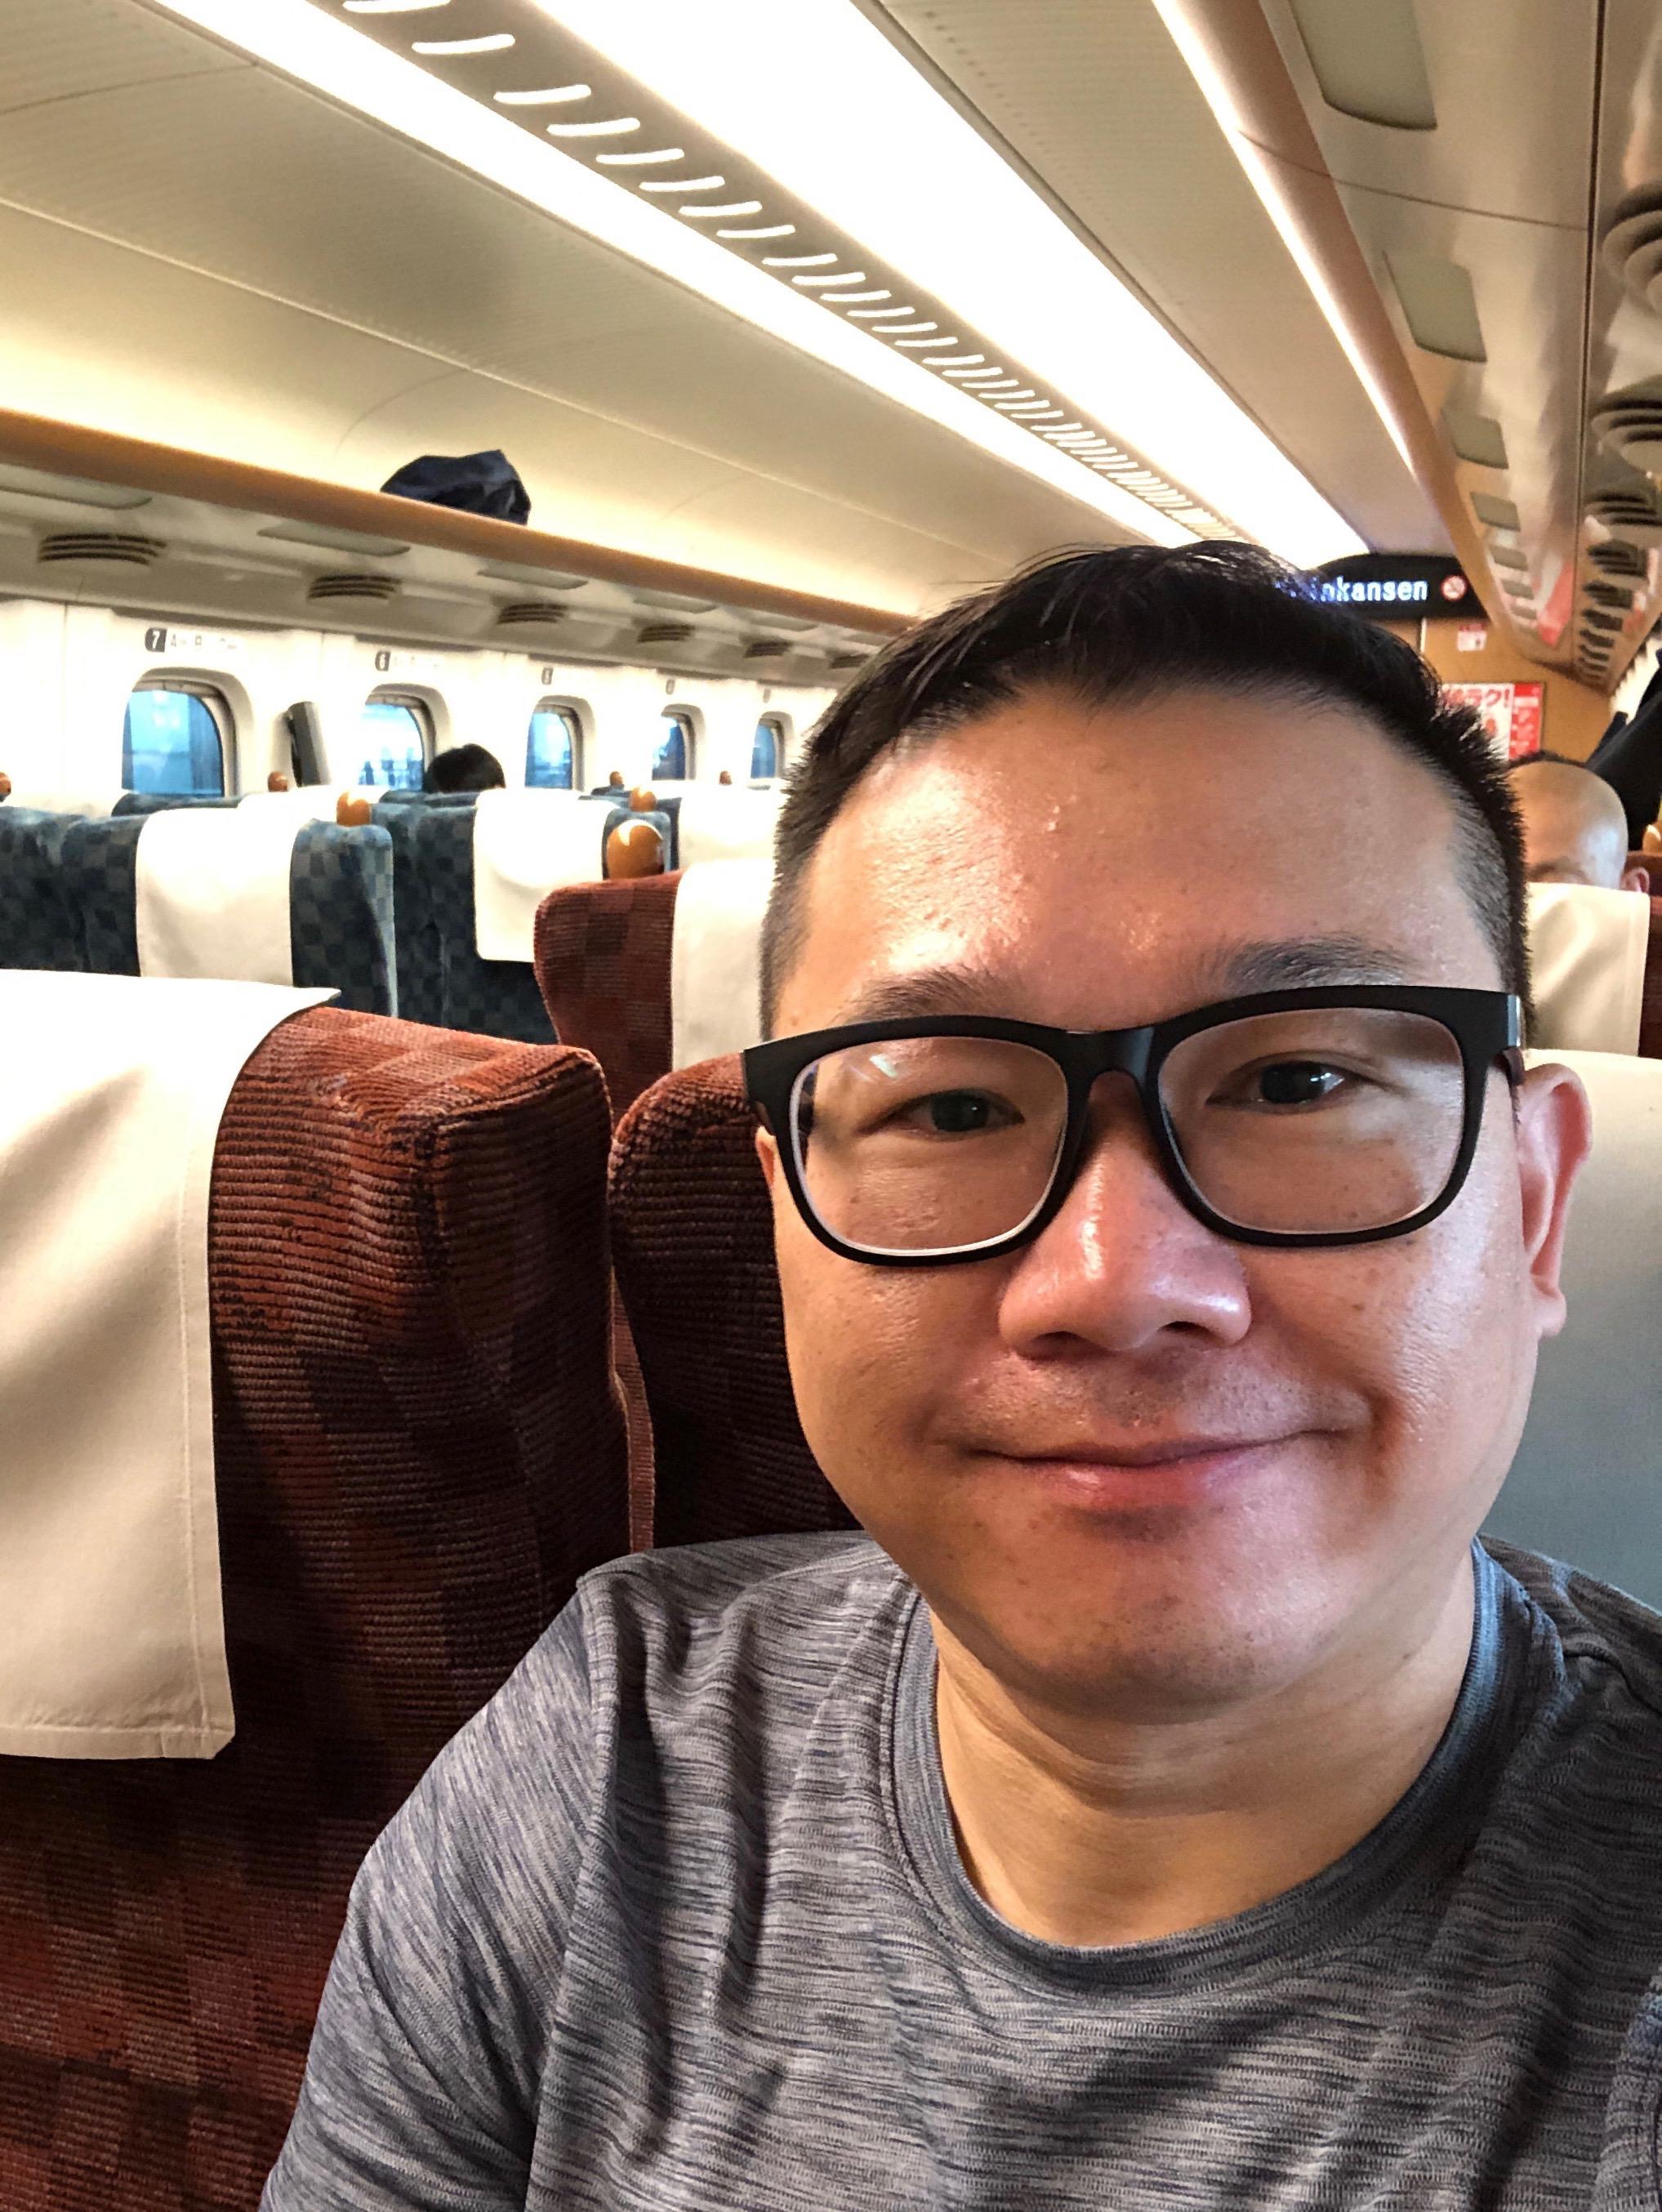 Riding my first Shinkansen.